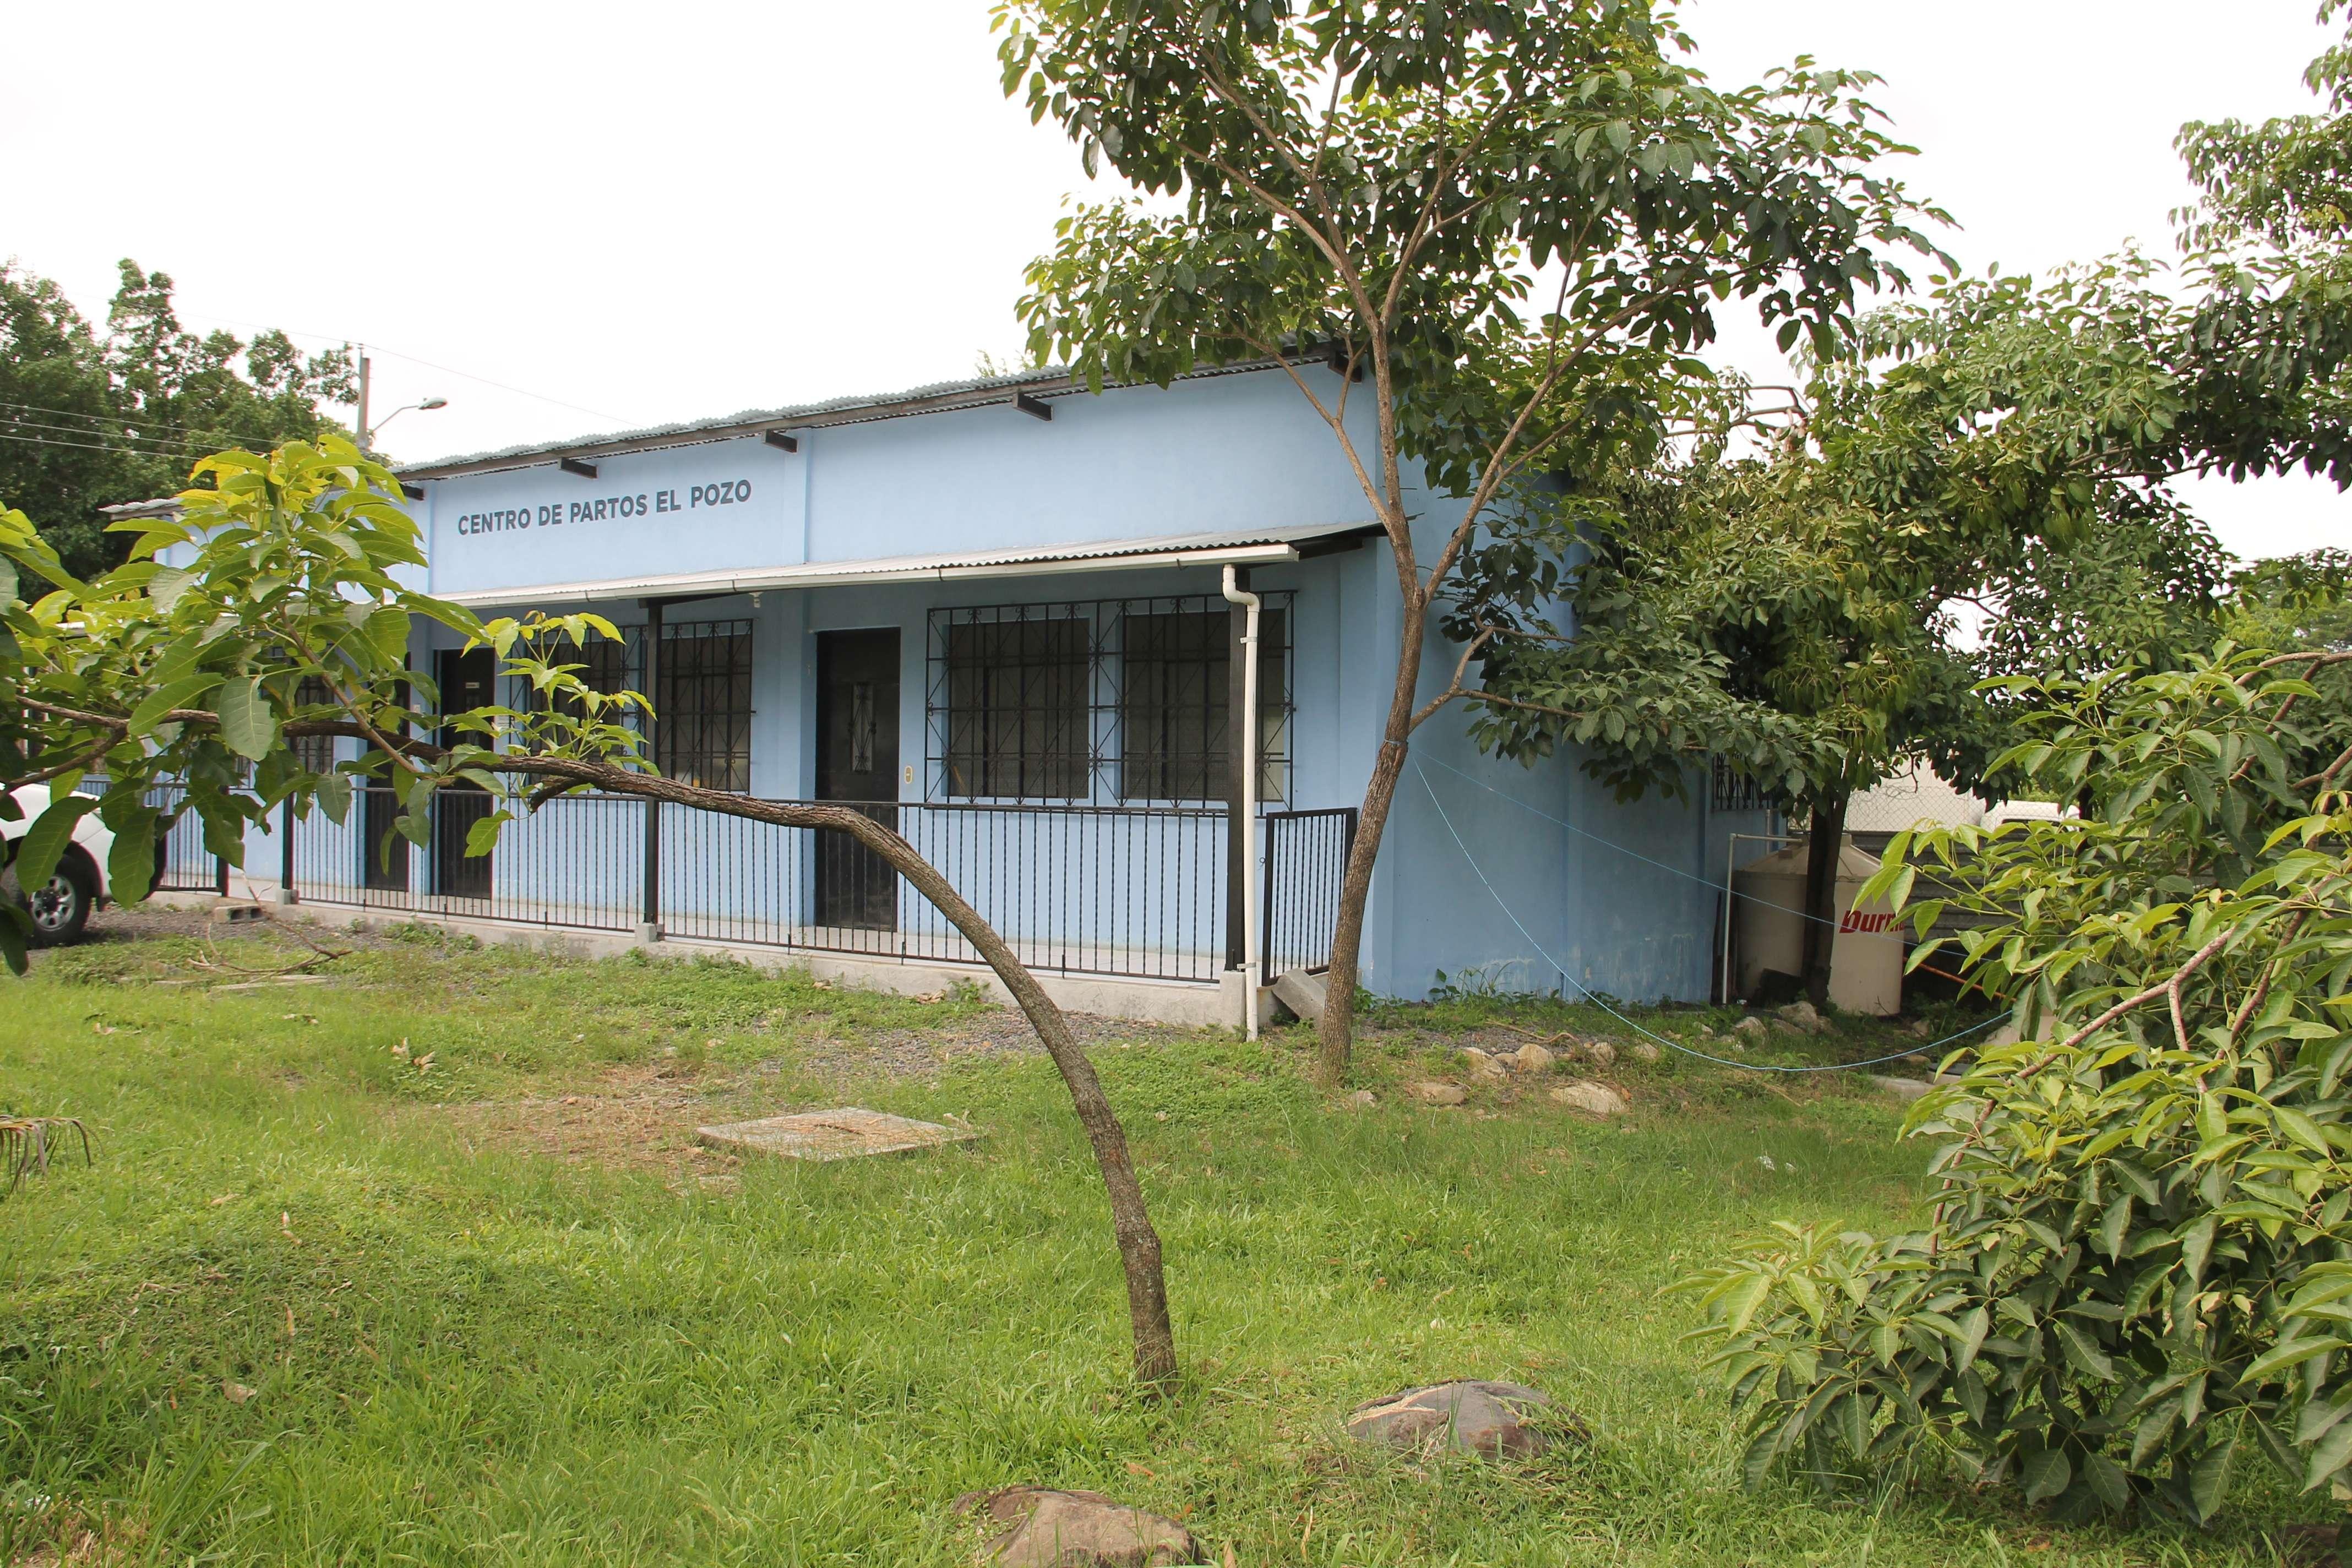 Image 6 Building